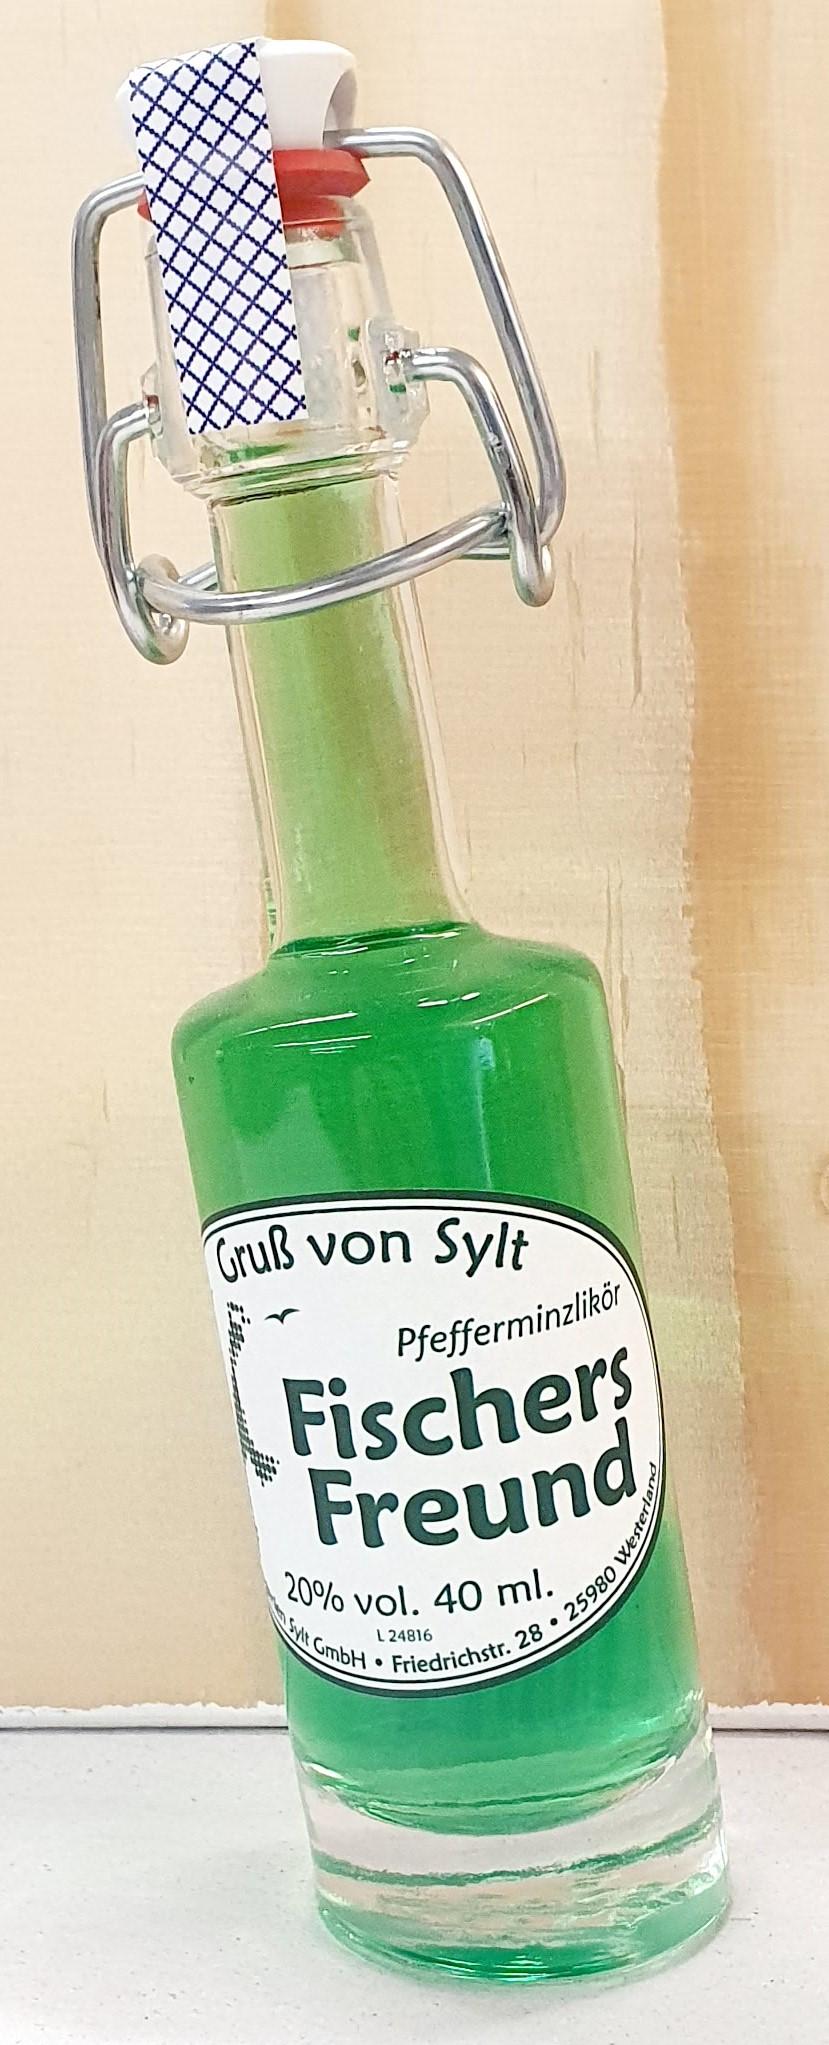 Pfefferminzlikör | Schmidts Drogerien